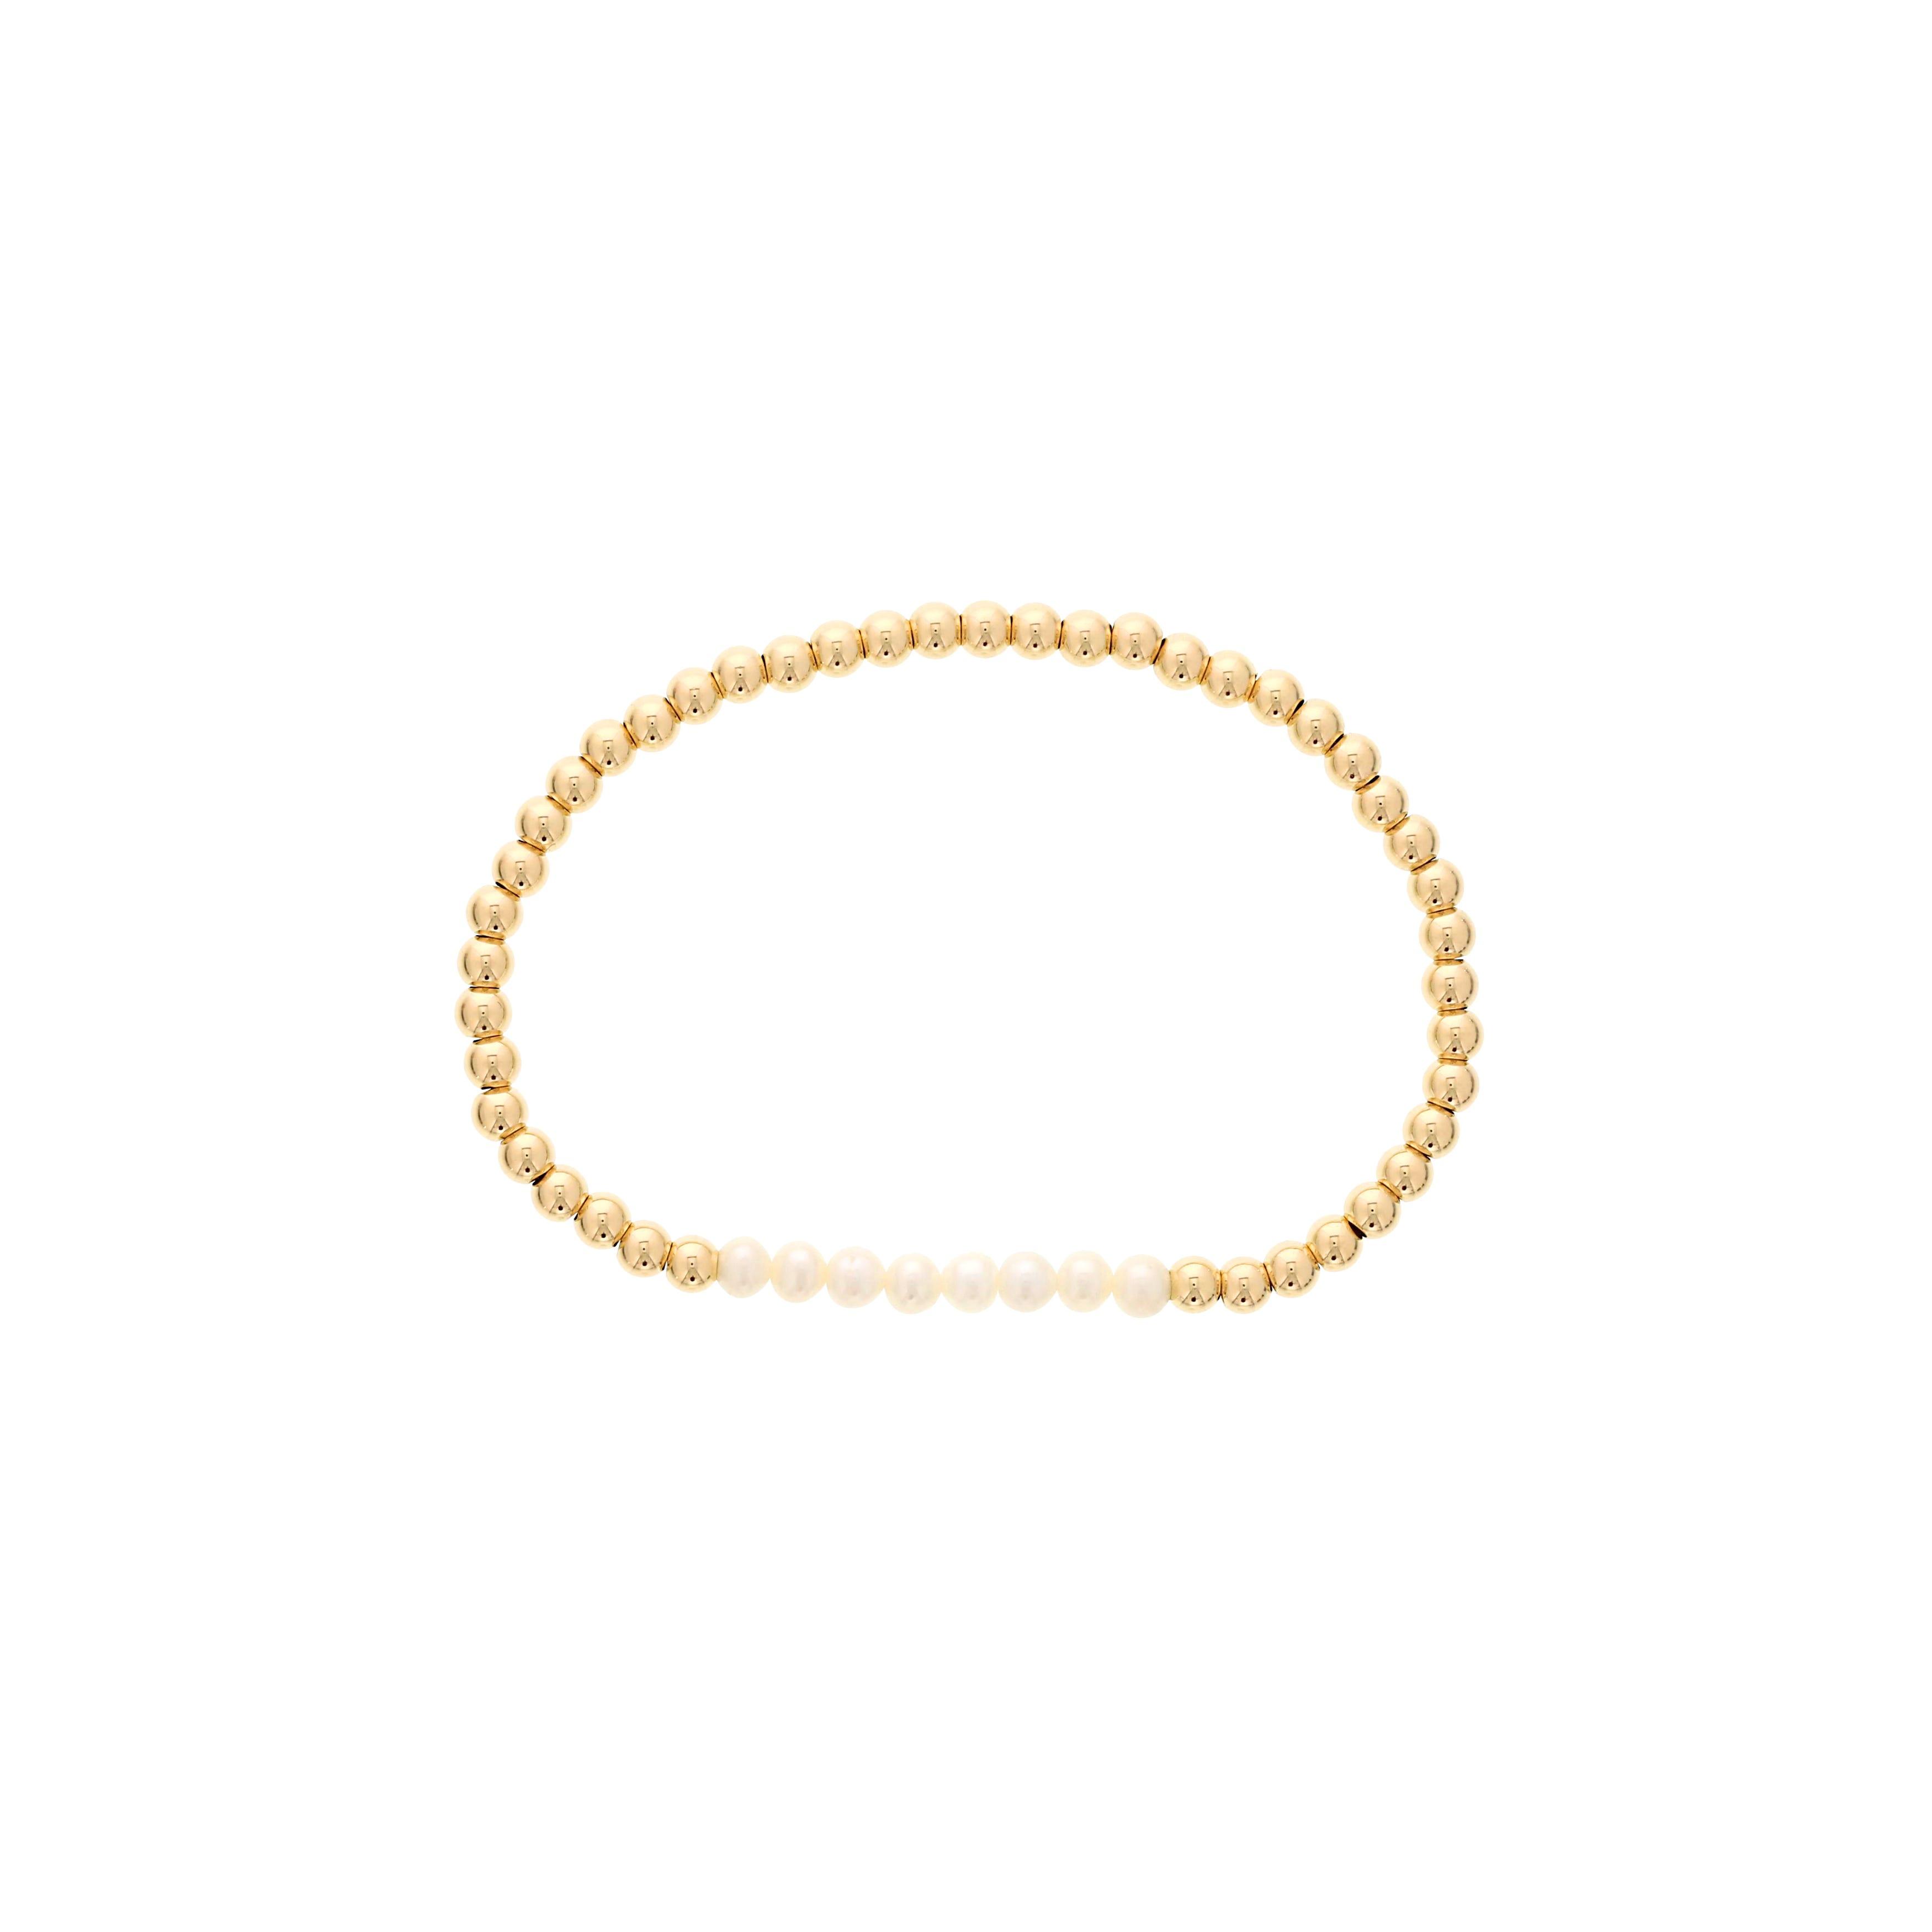 Pearl Birthstone Beaded Bracelet Gold Filled